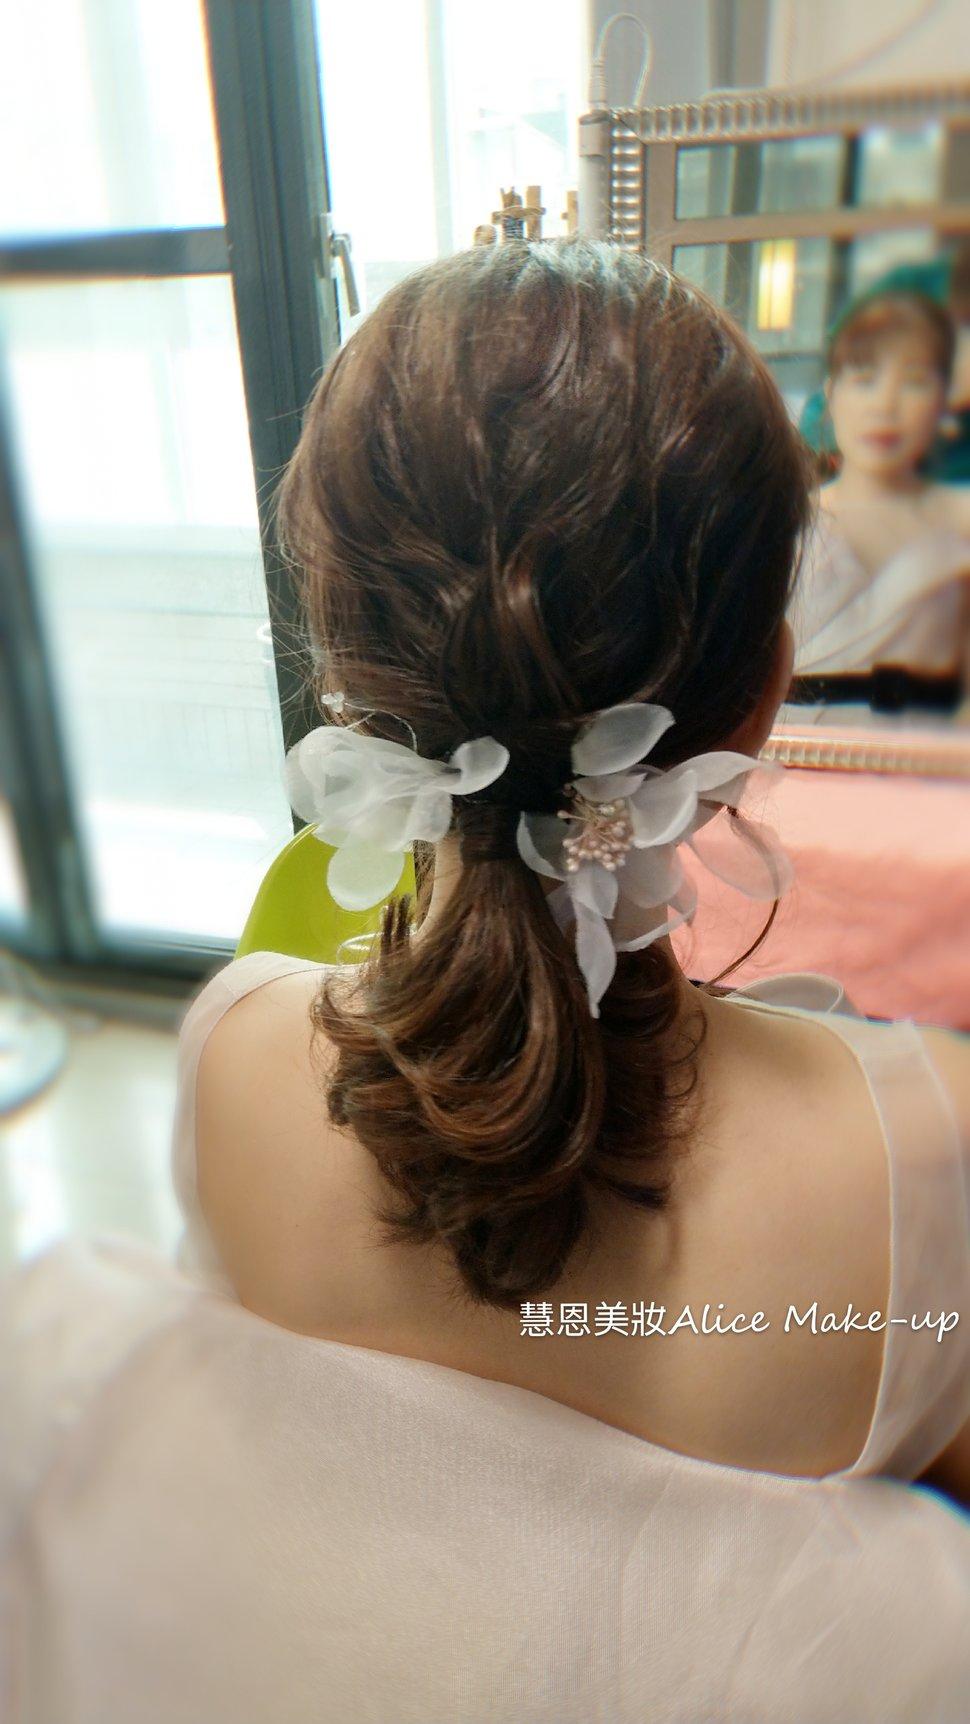 IMAG5929_mh1570259751111 - 慧恩美妝造型Alice Make-up《結婚吧》